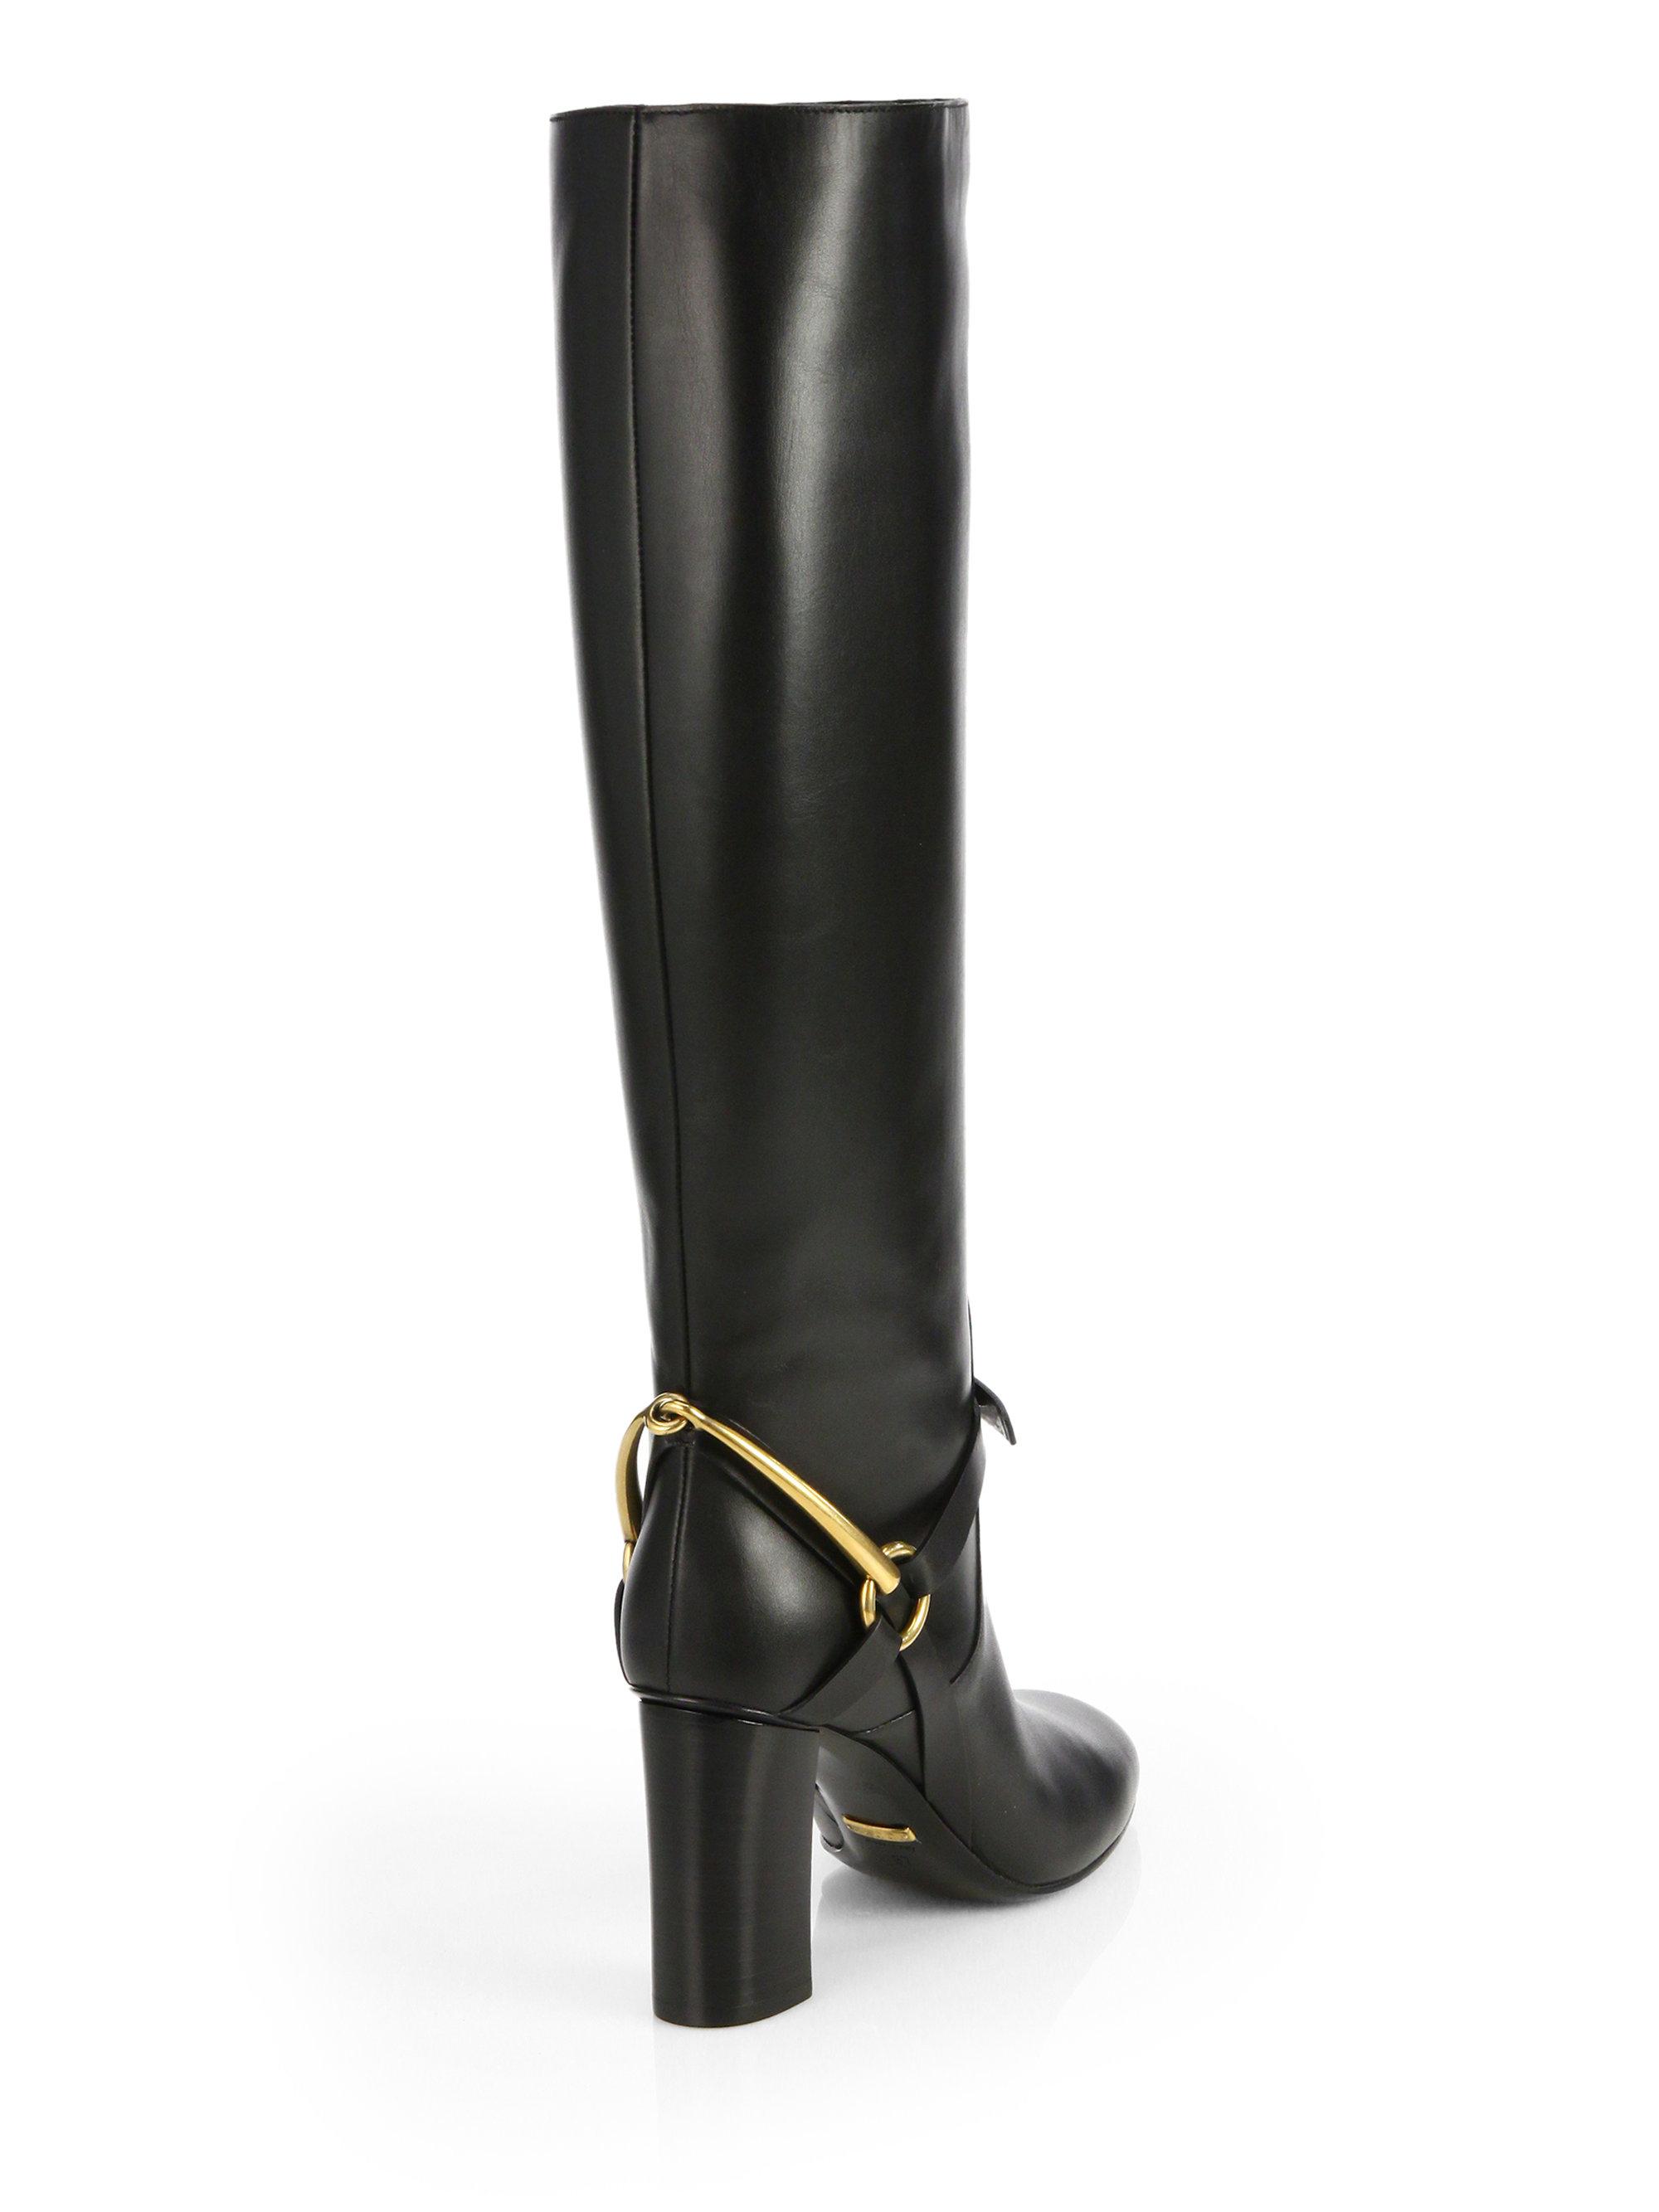 Gucci Tess Leather Horsebit Kneehigh